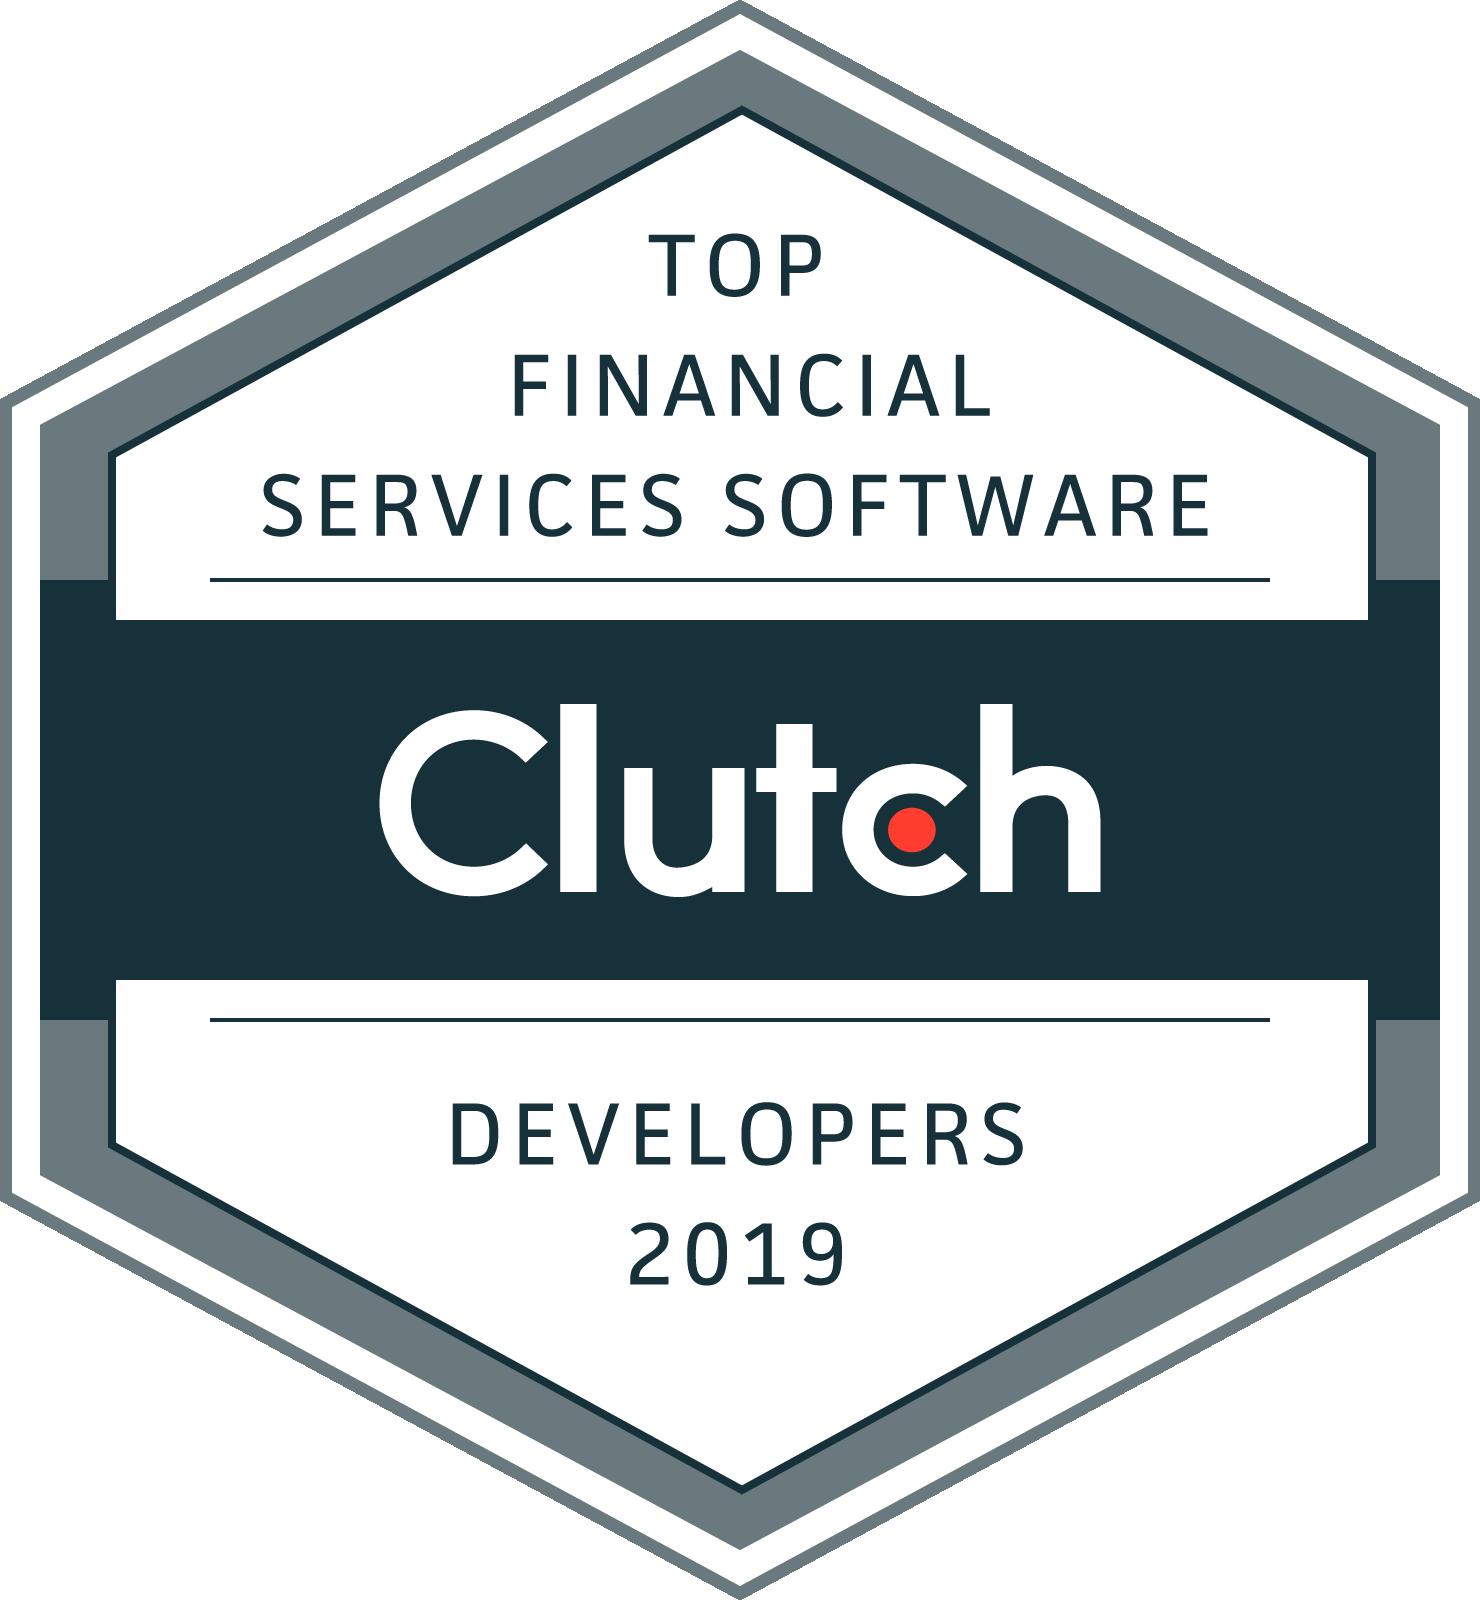 Top Financial Services Custom Software Development Companies